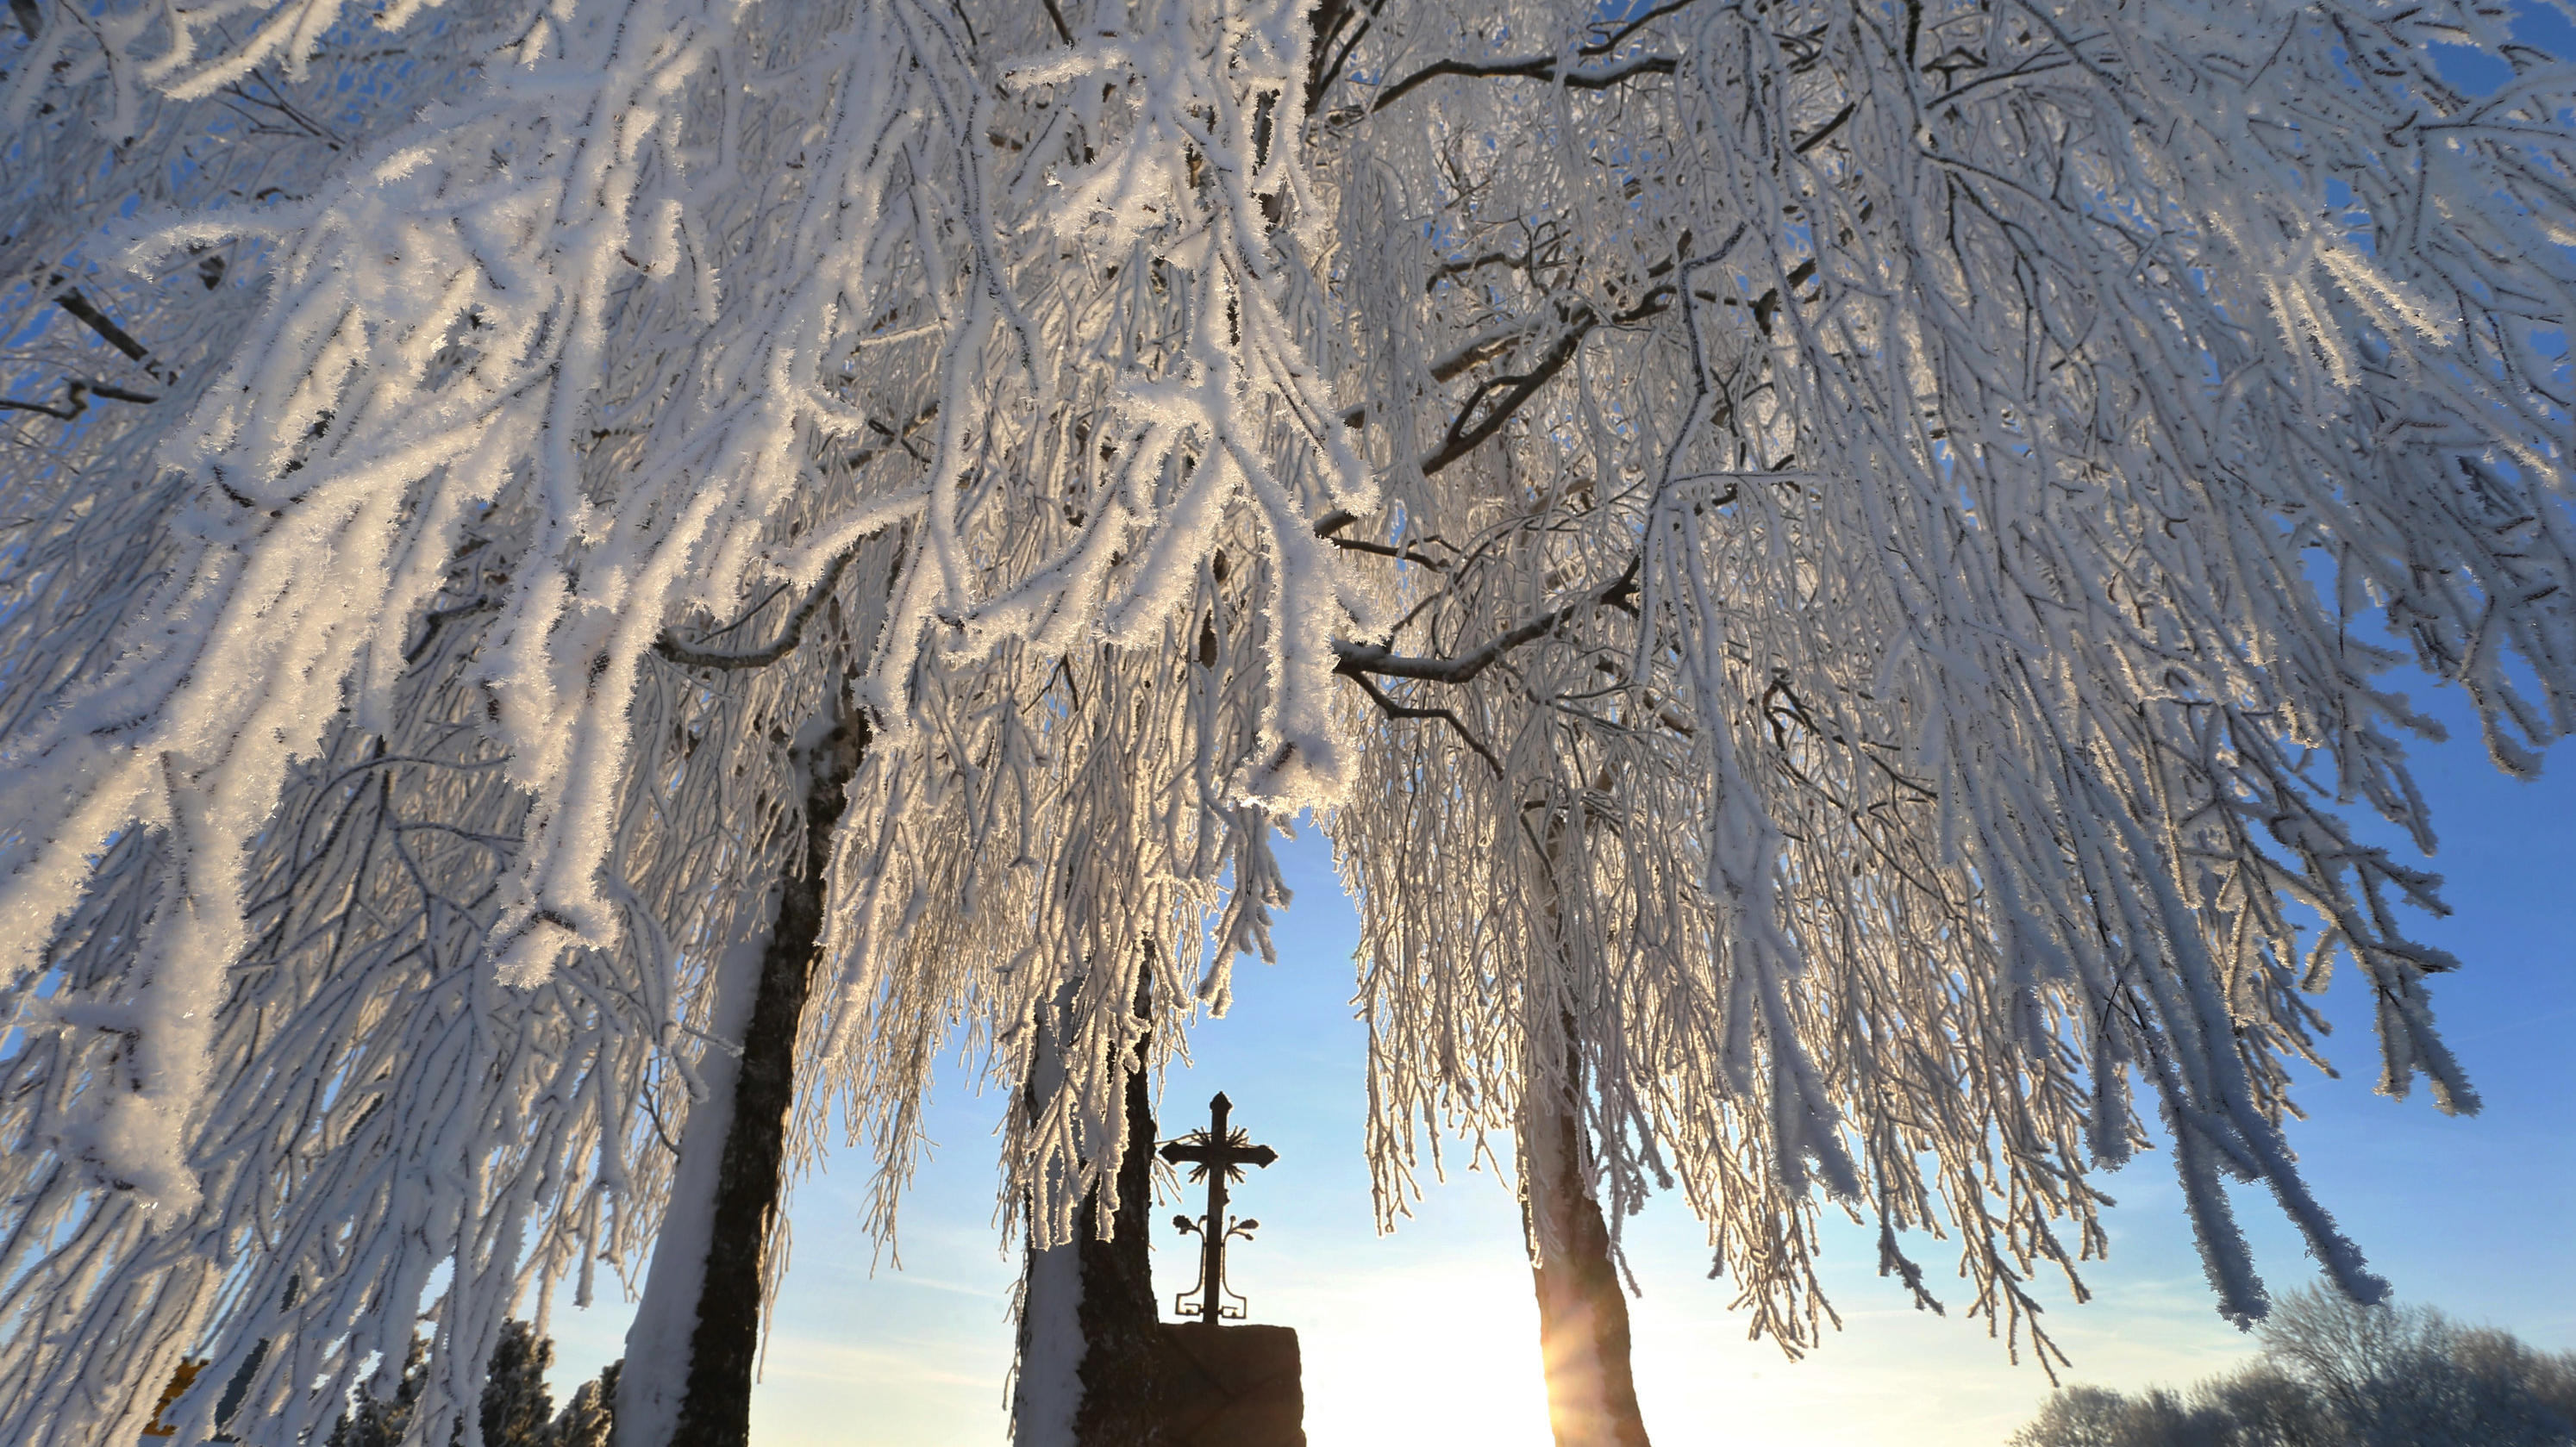 Wetter Frost